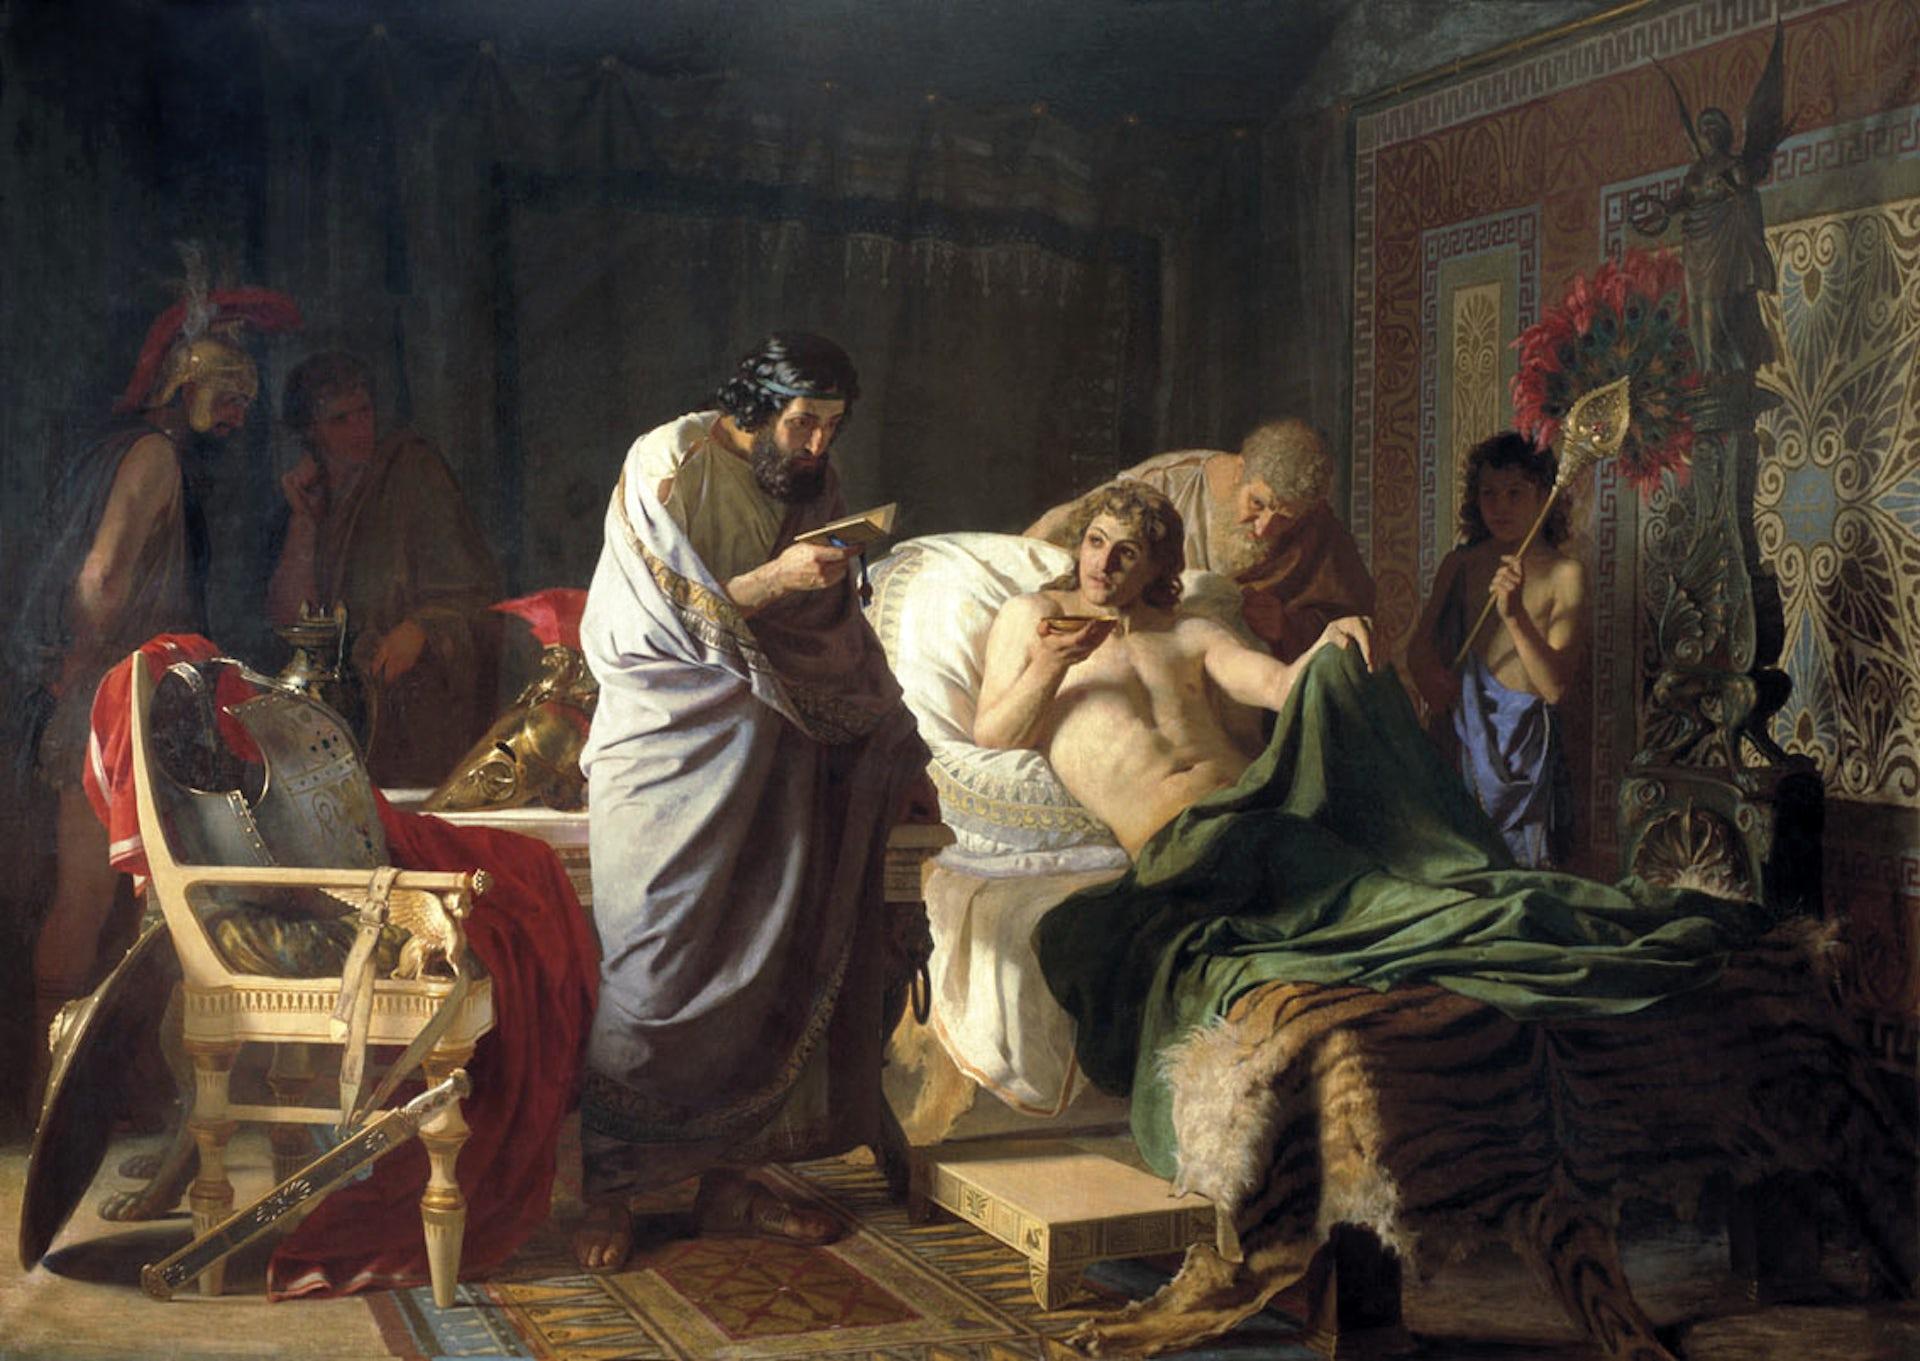 Methods of treating women in ancient Greece